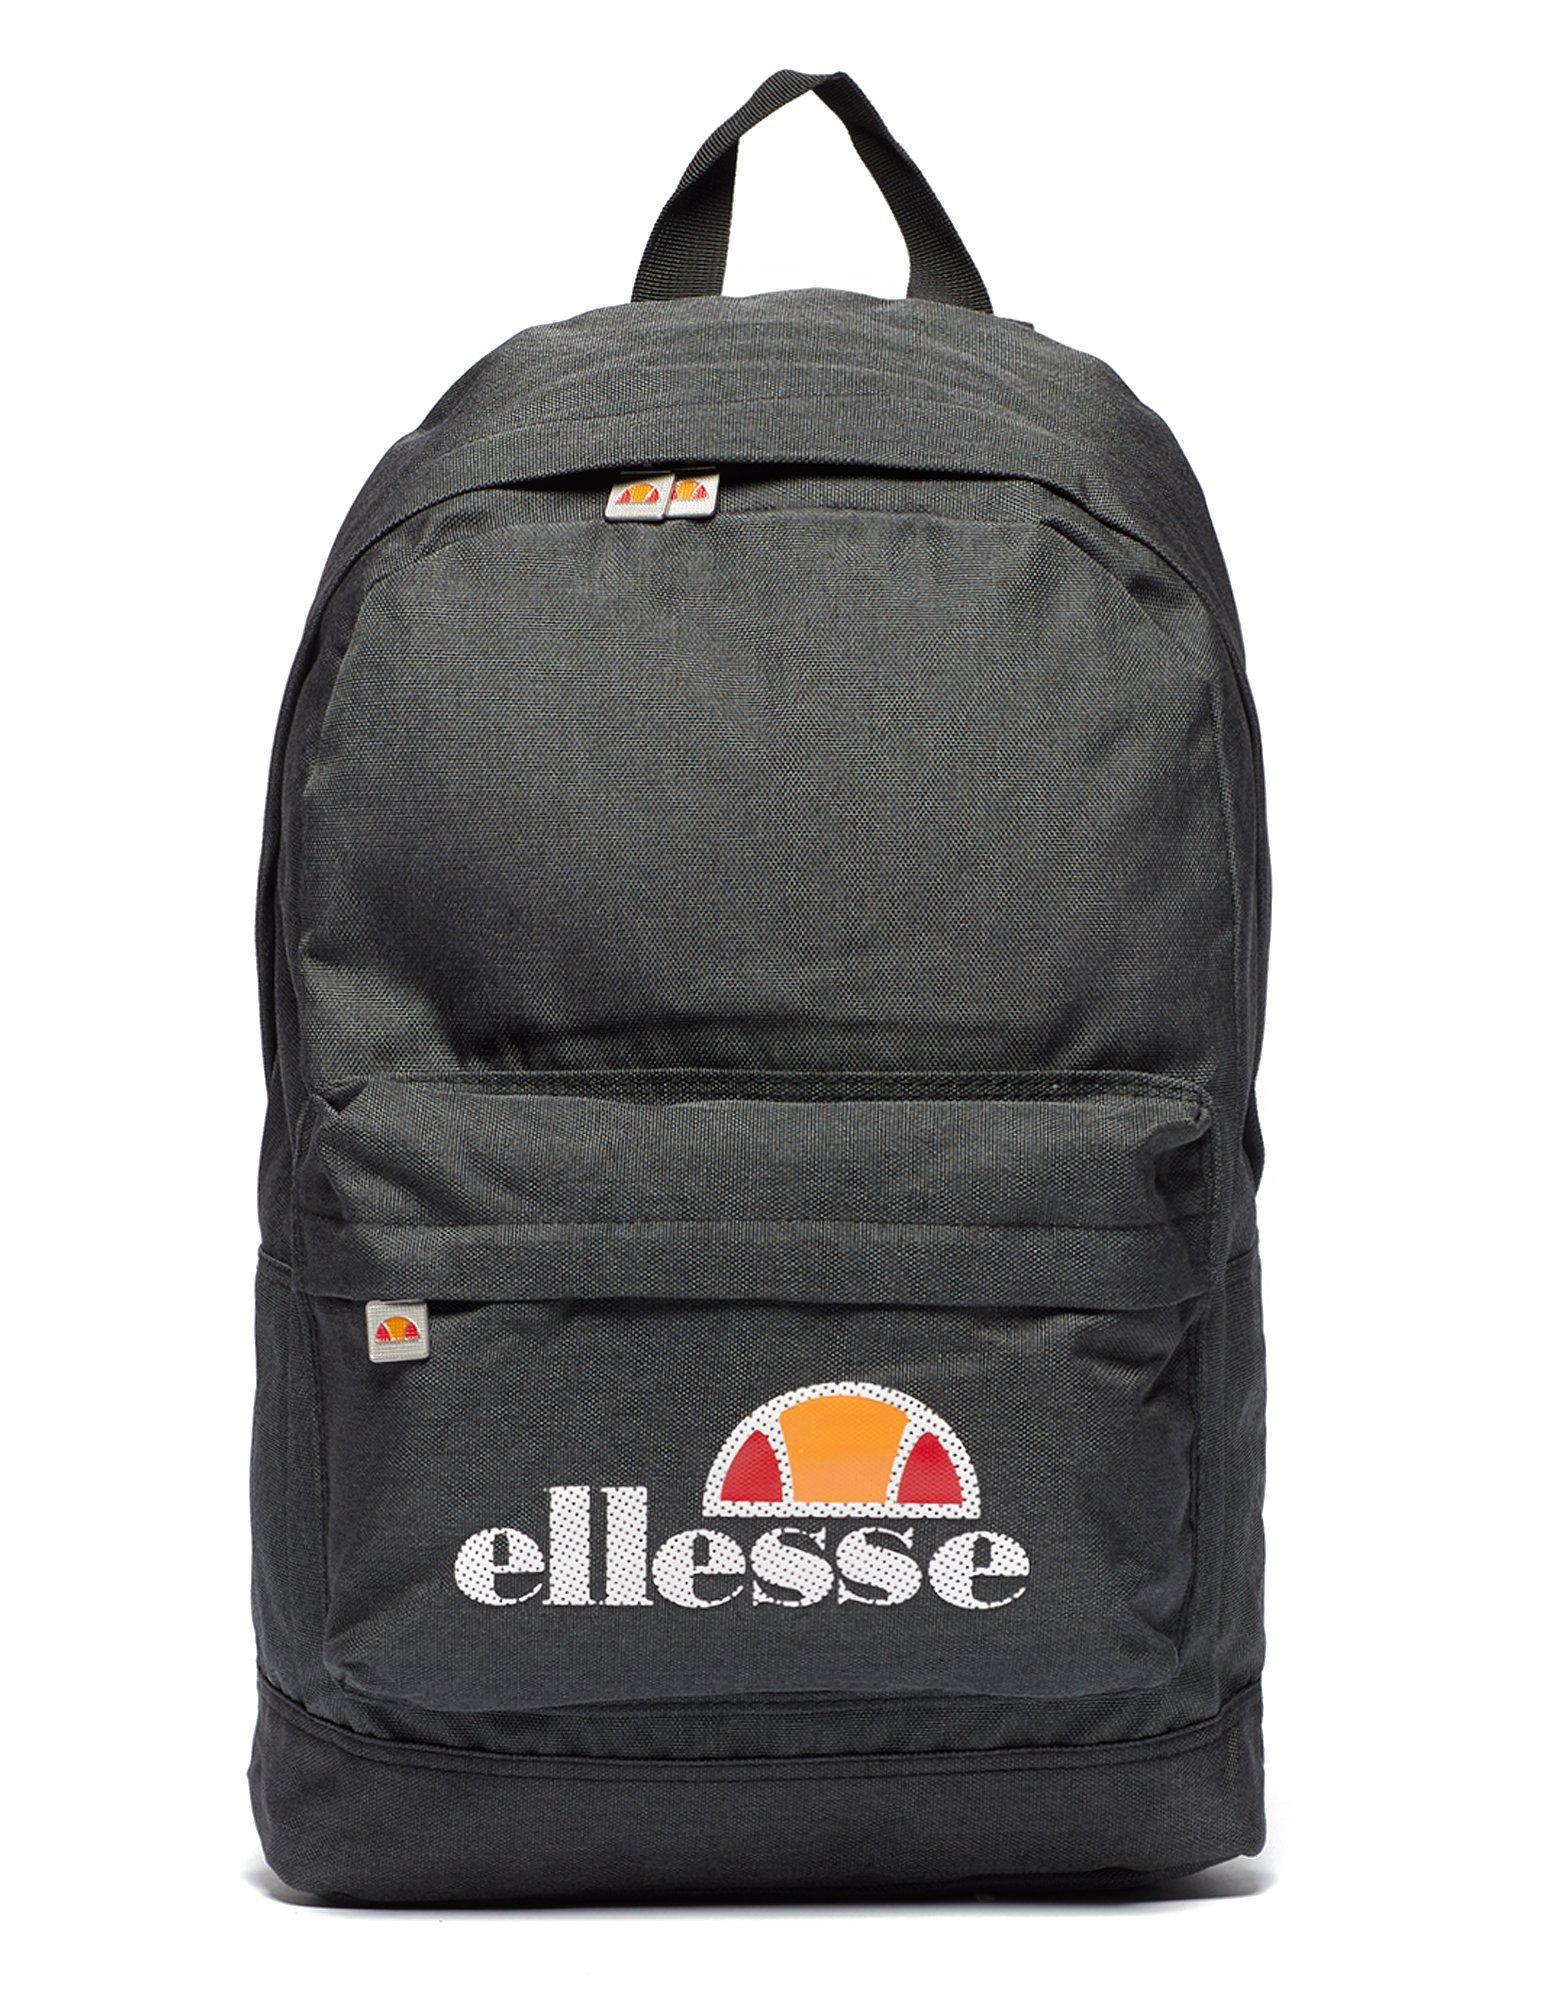 a796b482eb69 ... Ellesse Marino Backpack in Black for Men - Lyst best cheap 2d04b 02509  ...